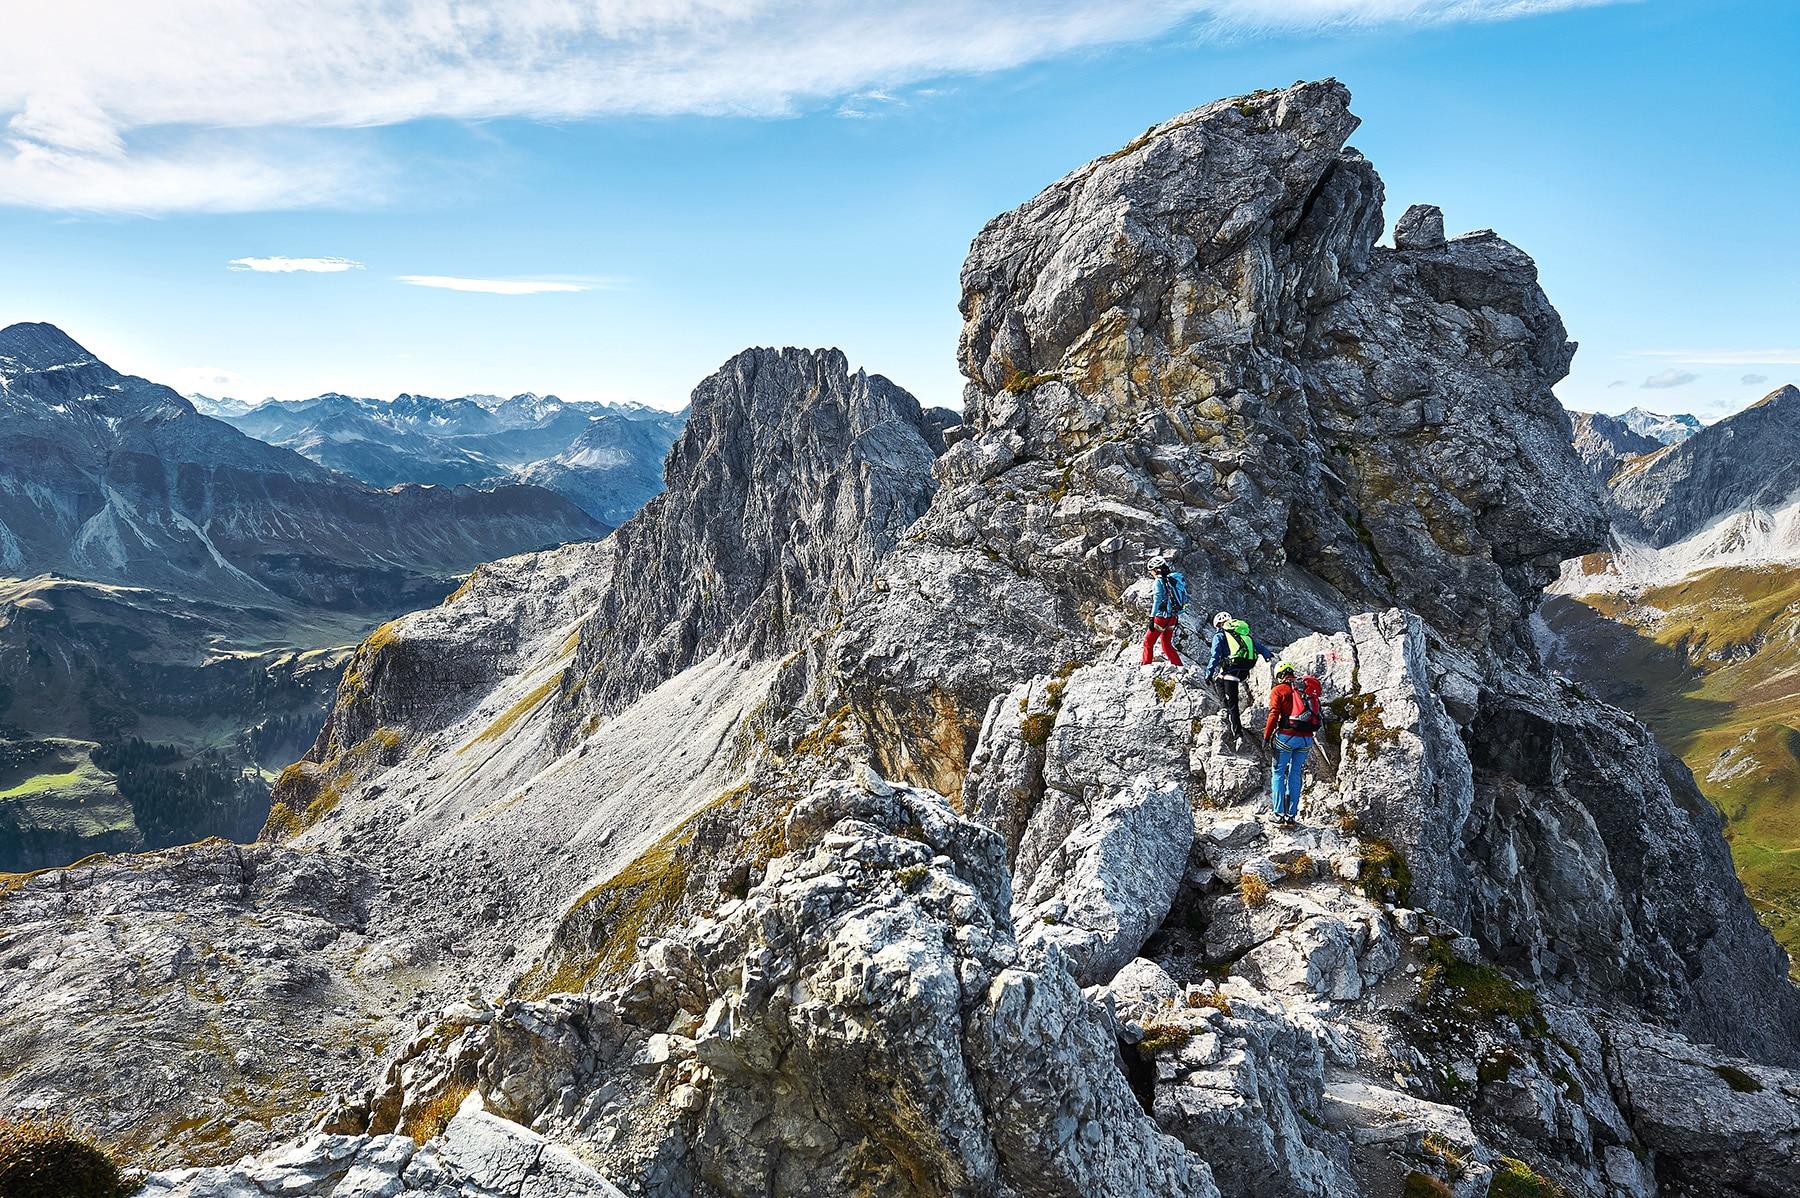 Klettersteig Kleinwalsertal : Klettersteige mindelheimer km bergwelten